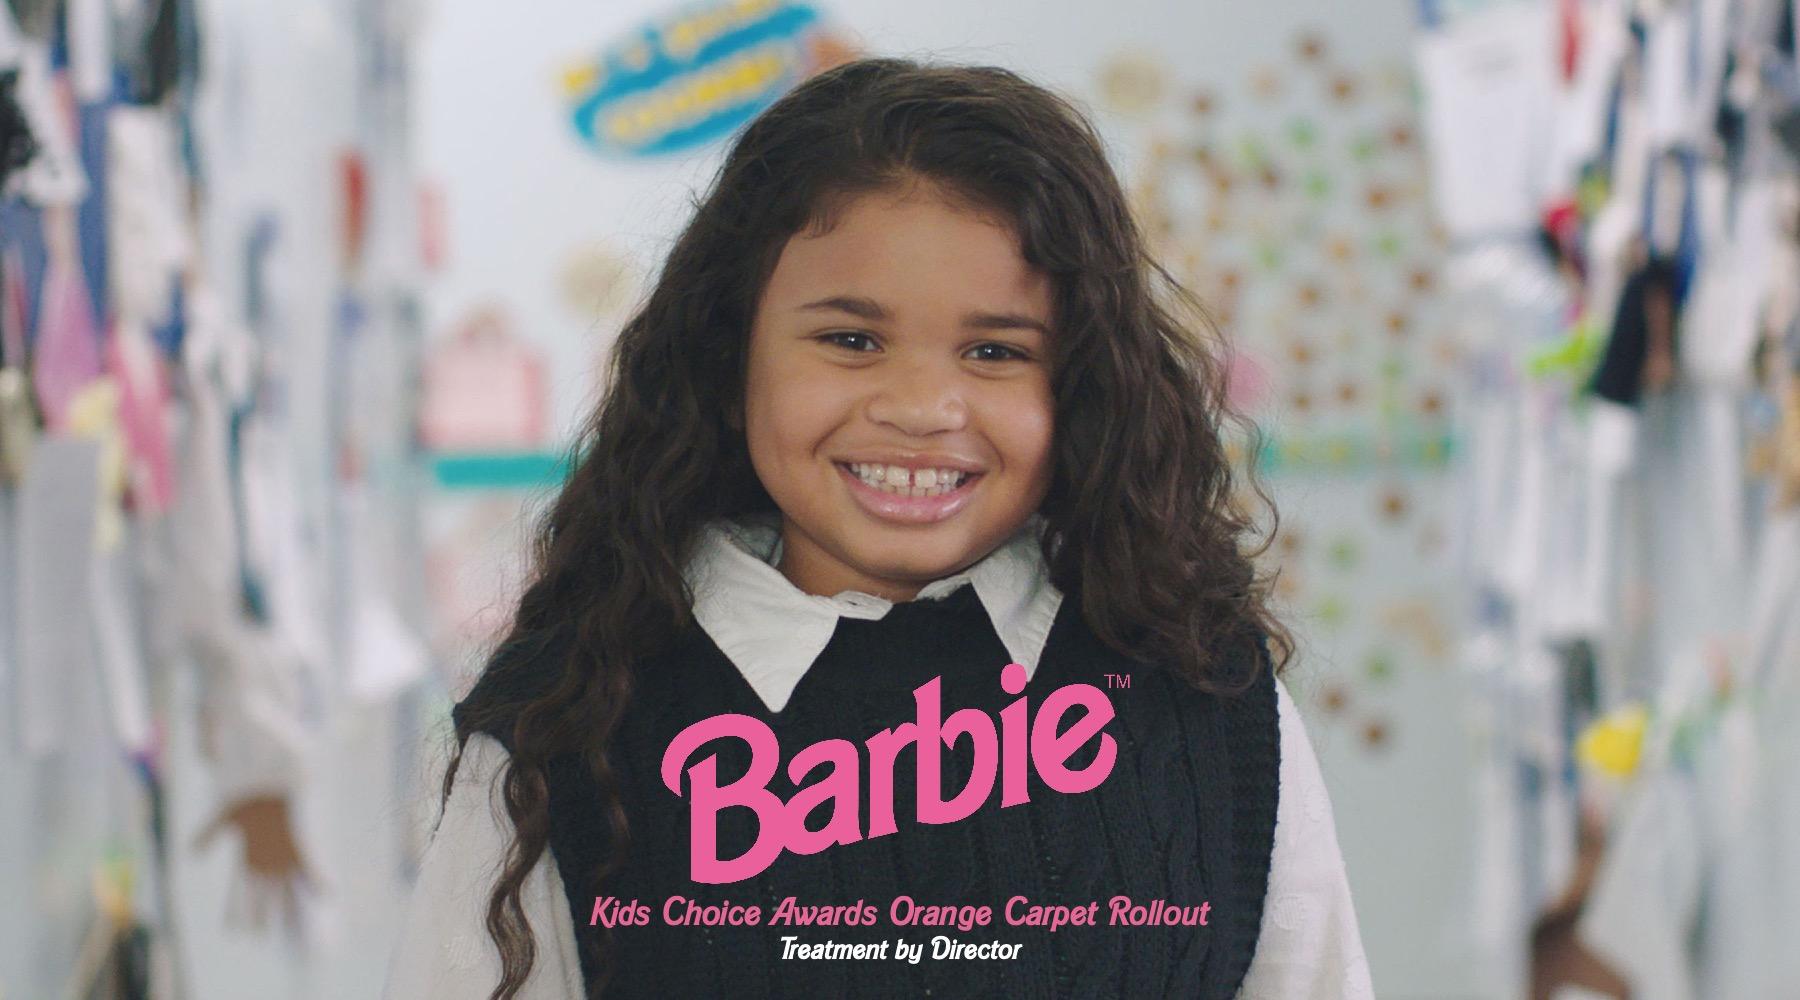 SD_Barbie Scrubbed 1.jpeg